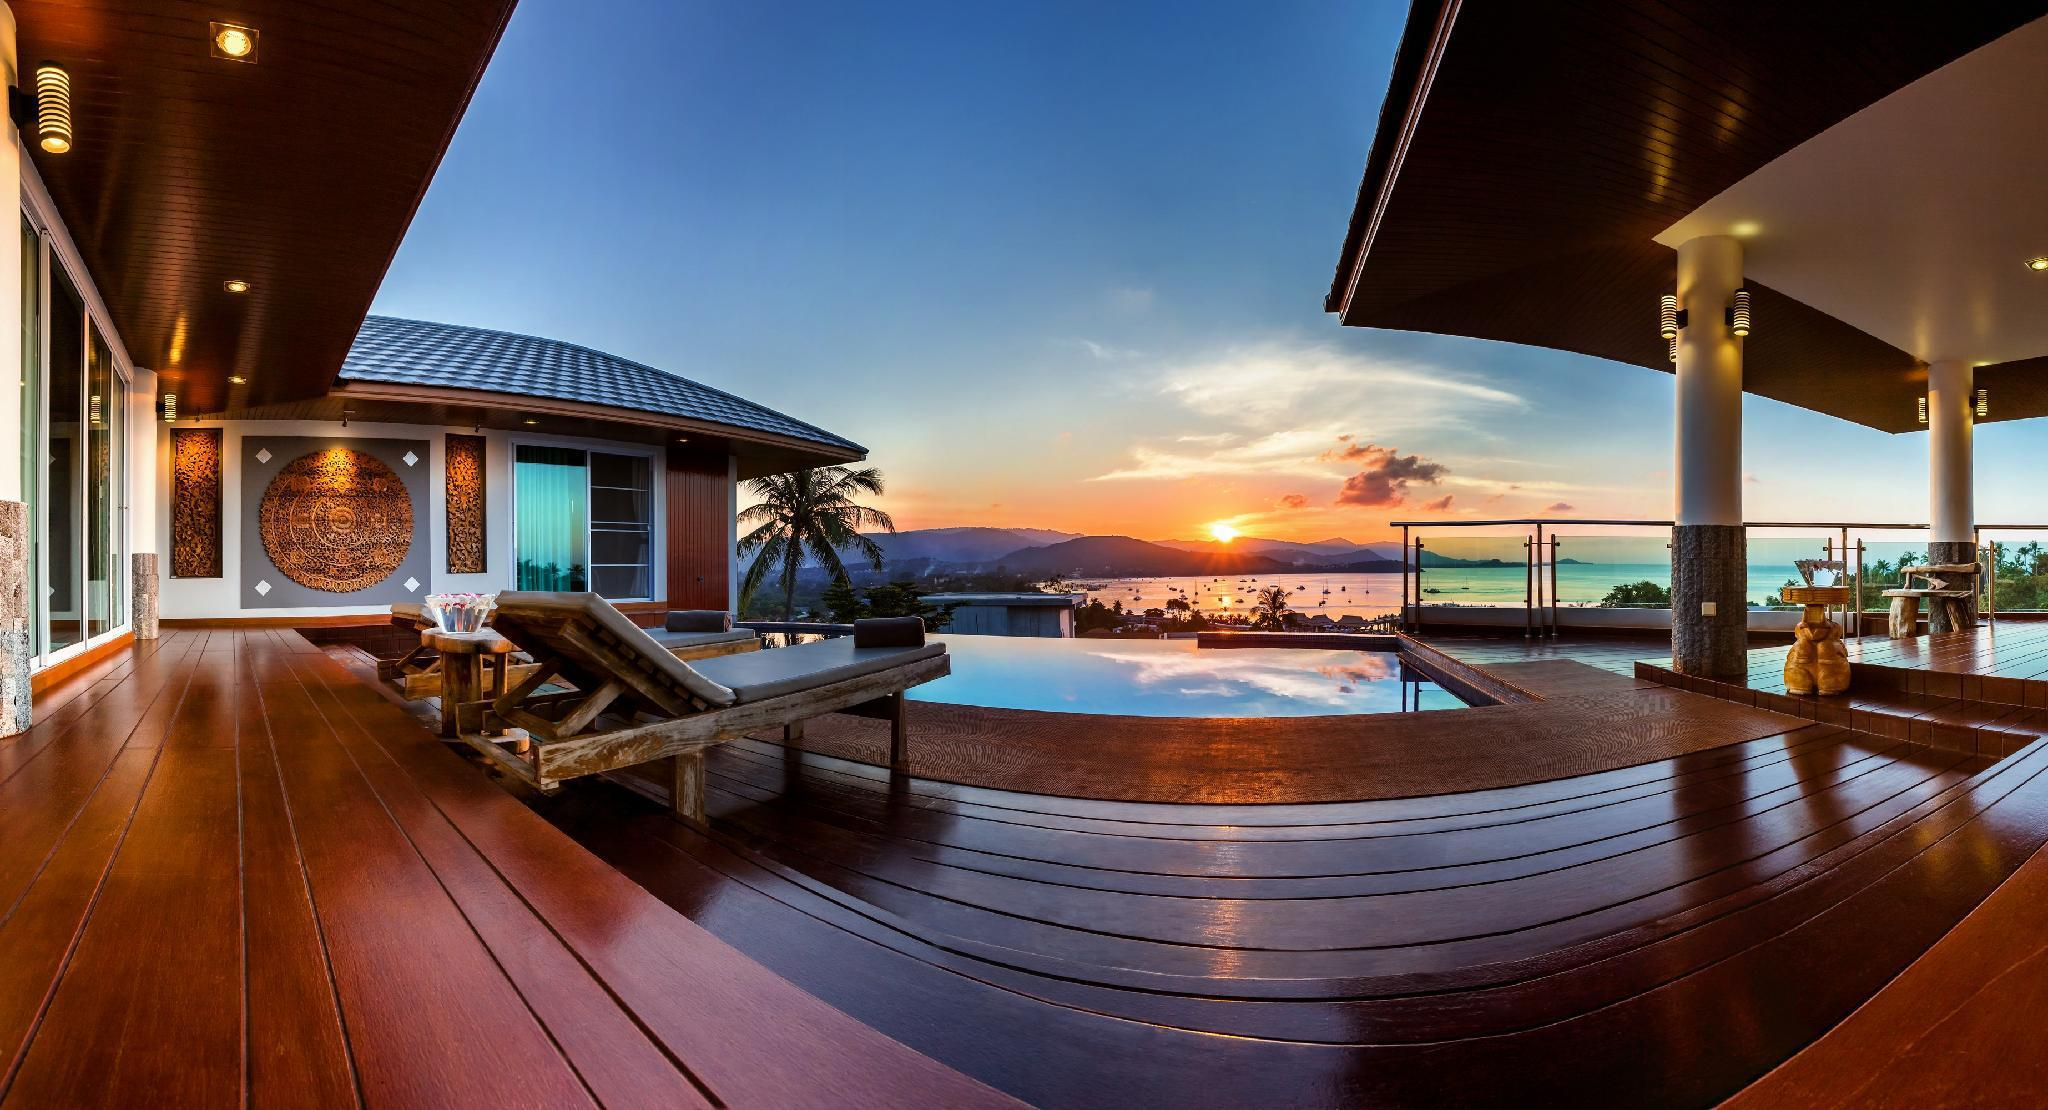 Sunset Pool Villa at Pier, Center of main facility วิลลา 5 ห้องนอน 7 ห้องน้ำส่วนตัว ขนาด 600 ตร.ม. – เชิงมน